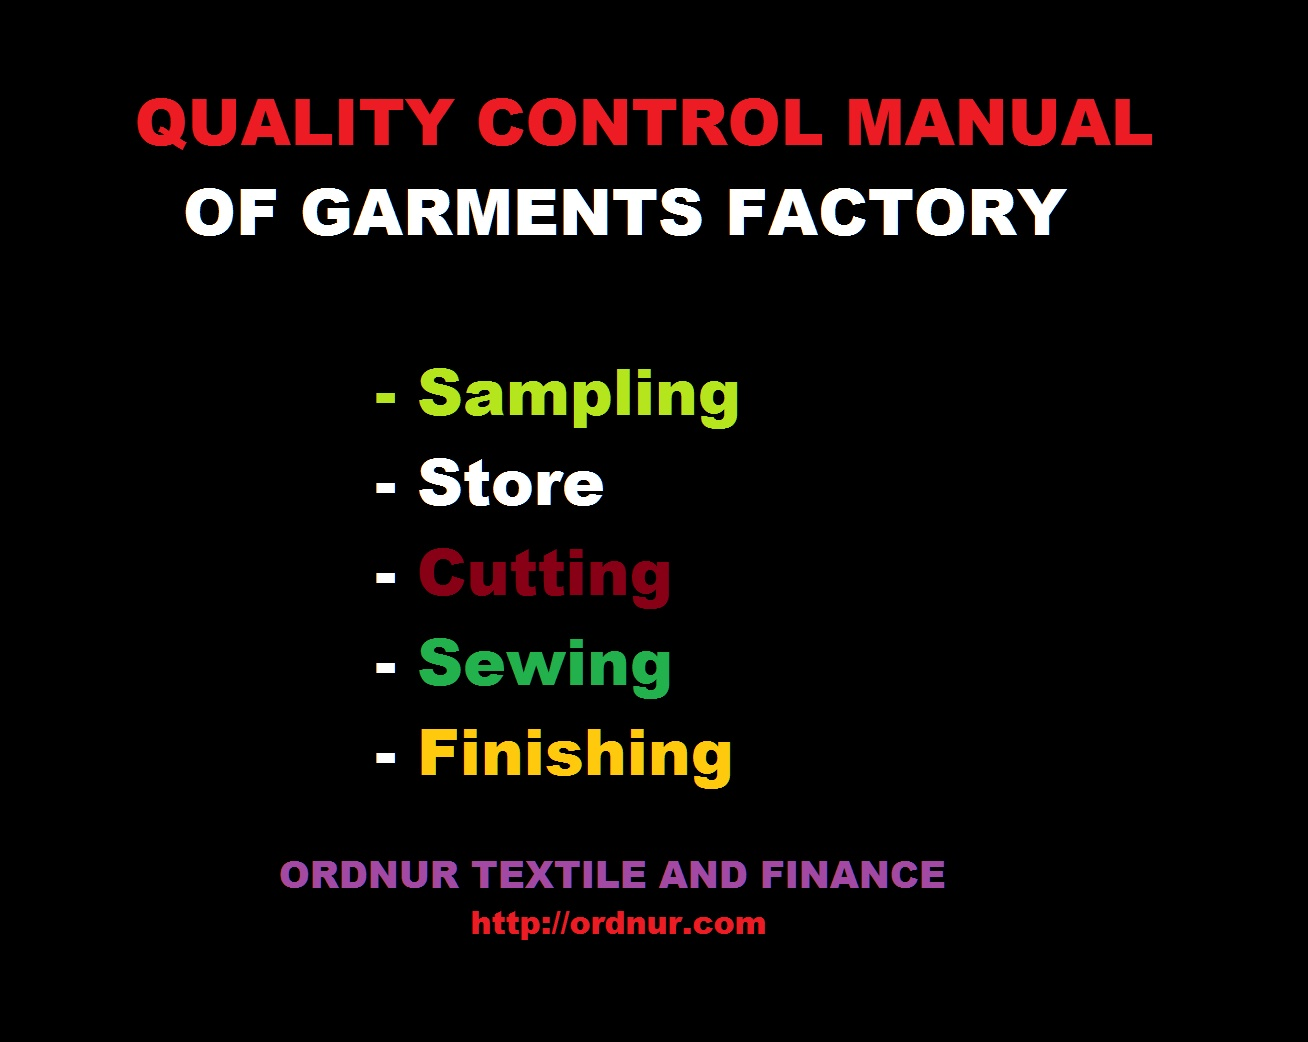 Quality Control Manual of Garments